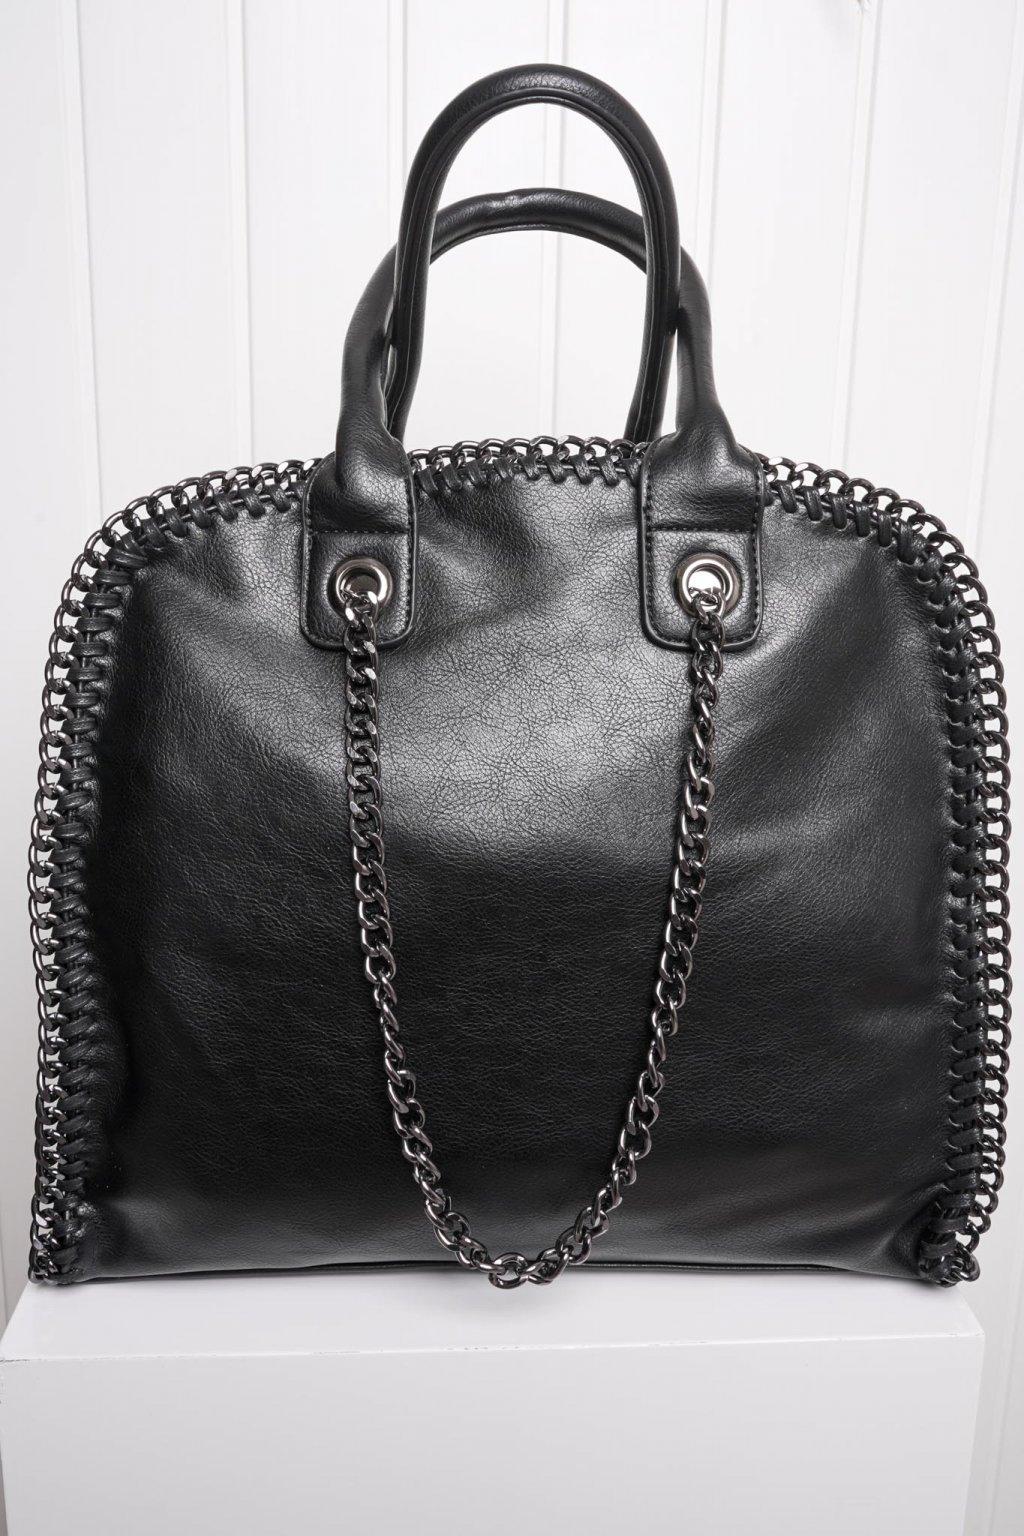 Kabelka, ruksak, dobrá cena, čierna kabelka, čierny ruksak, basic, kabelky, ruksaky 032